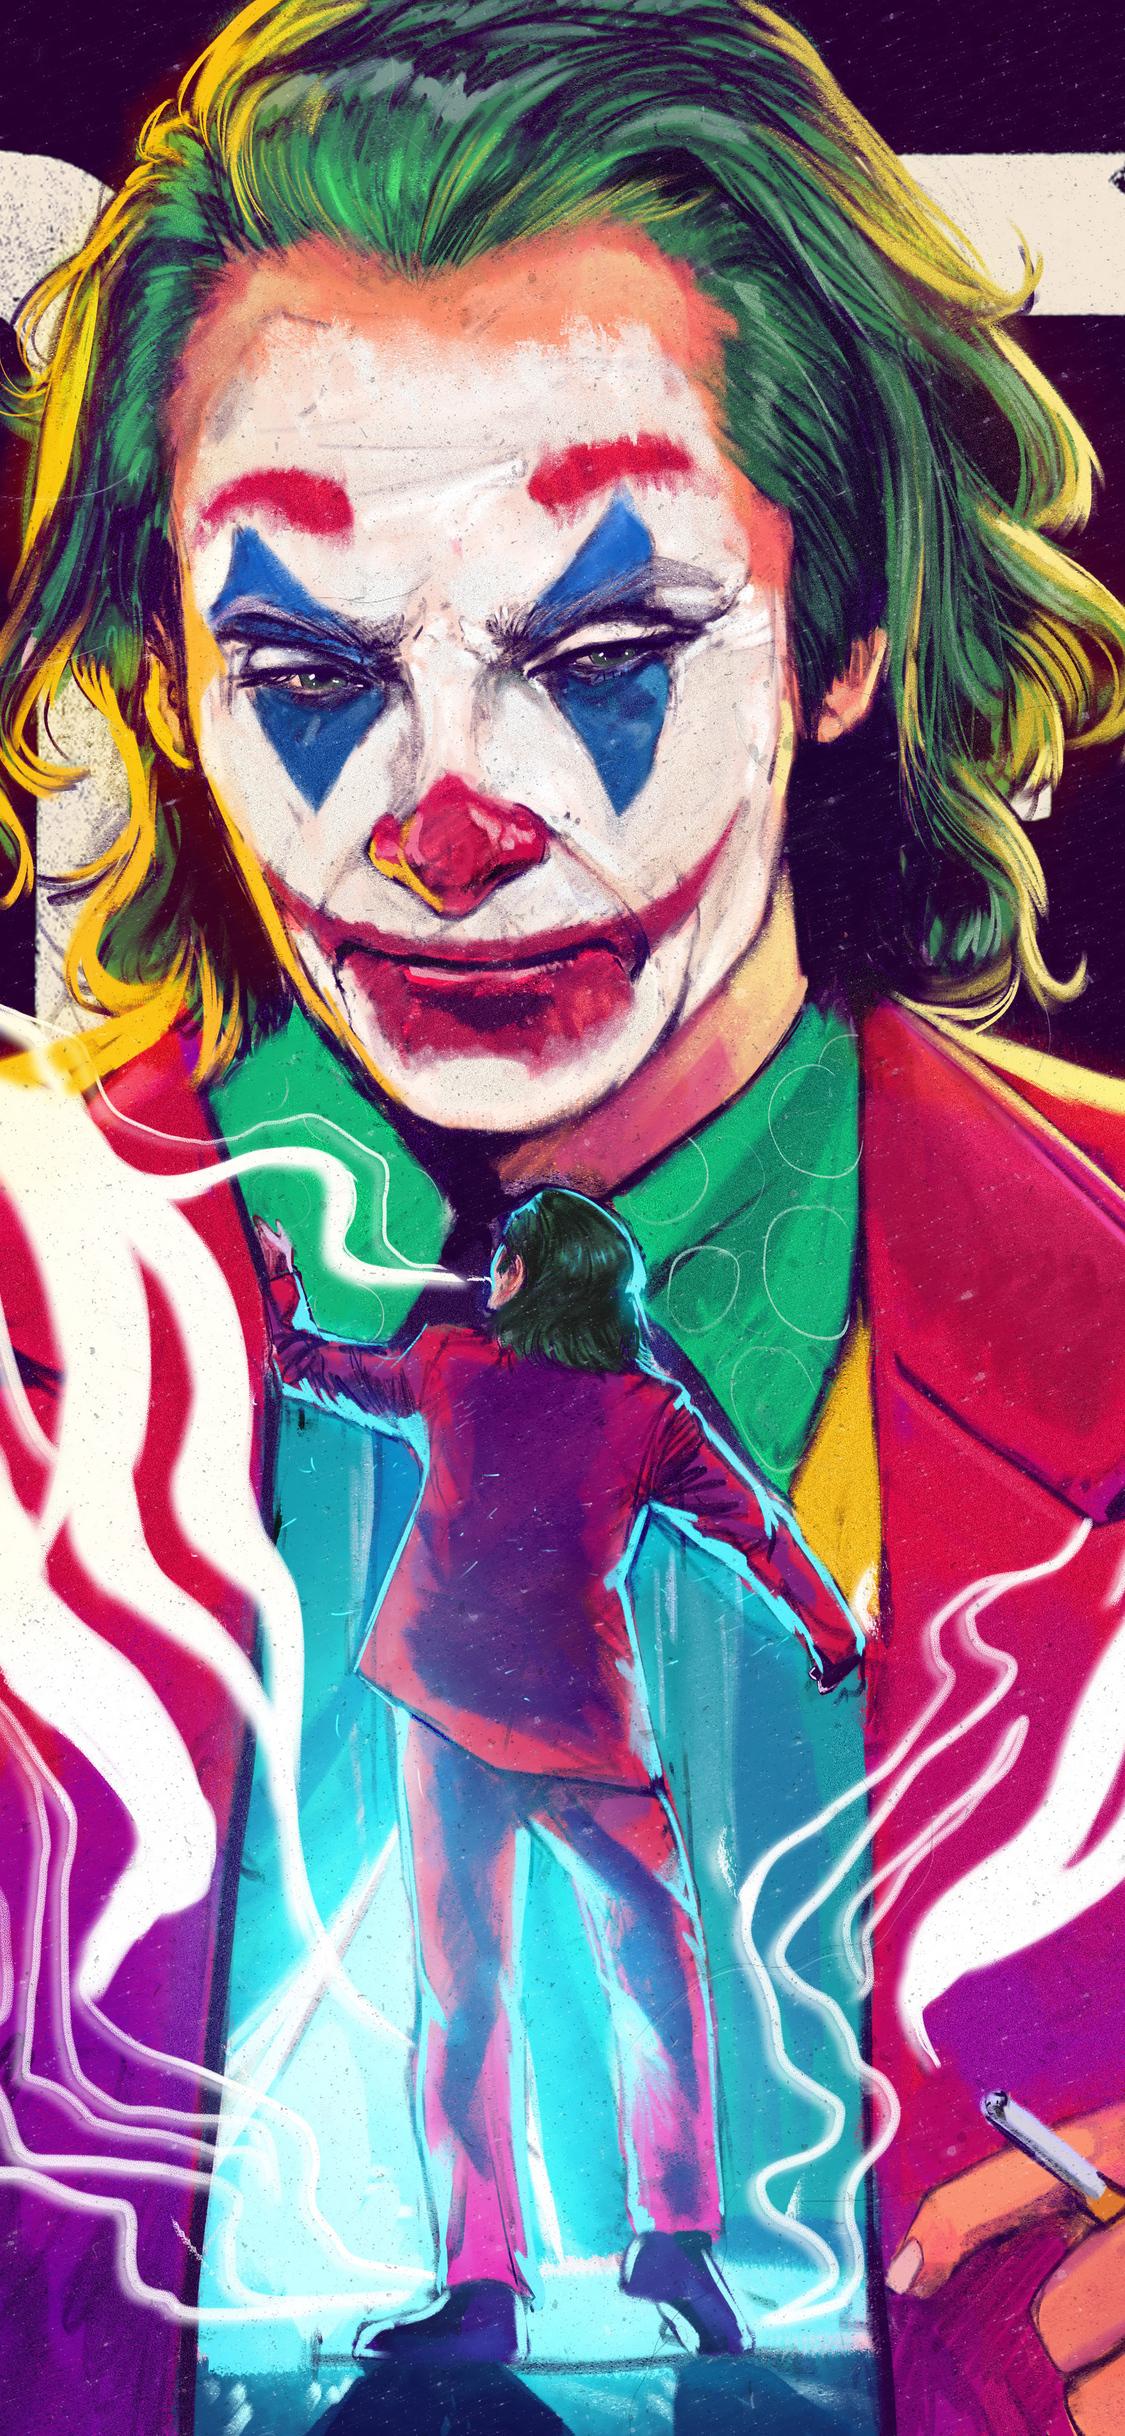 1125x2436 The Joker 4k Joaquin Phoenix Iphone Xs Iphone 10